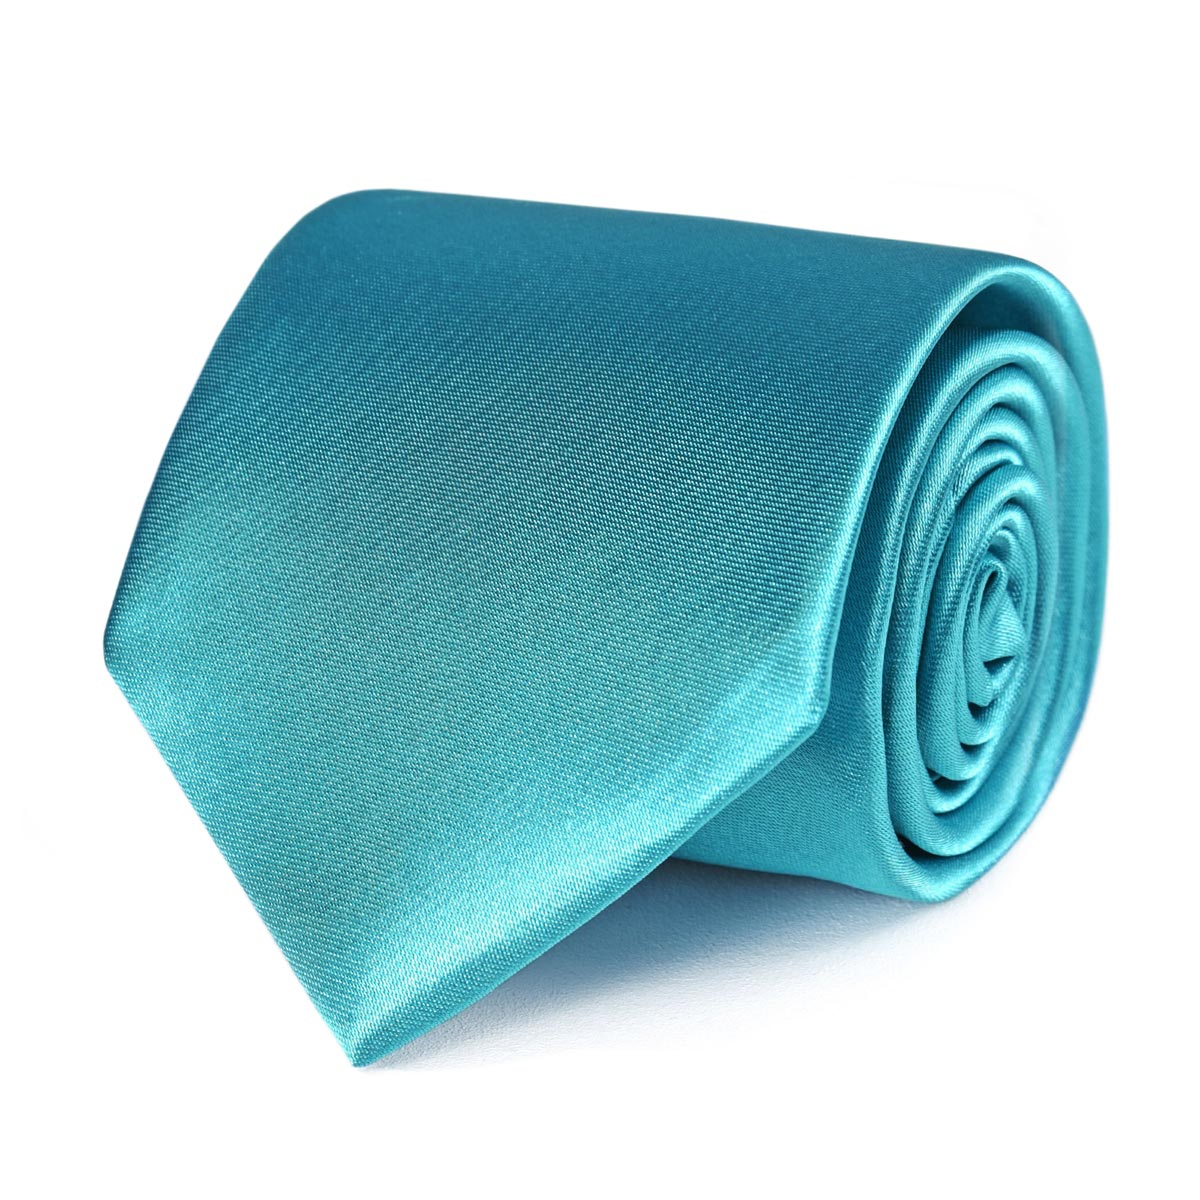 _Cravate-turquoise-homme